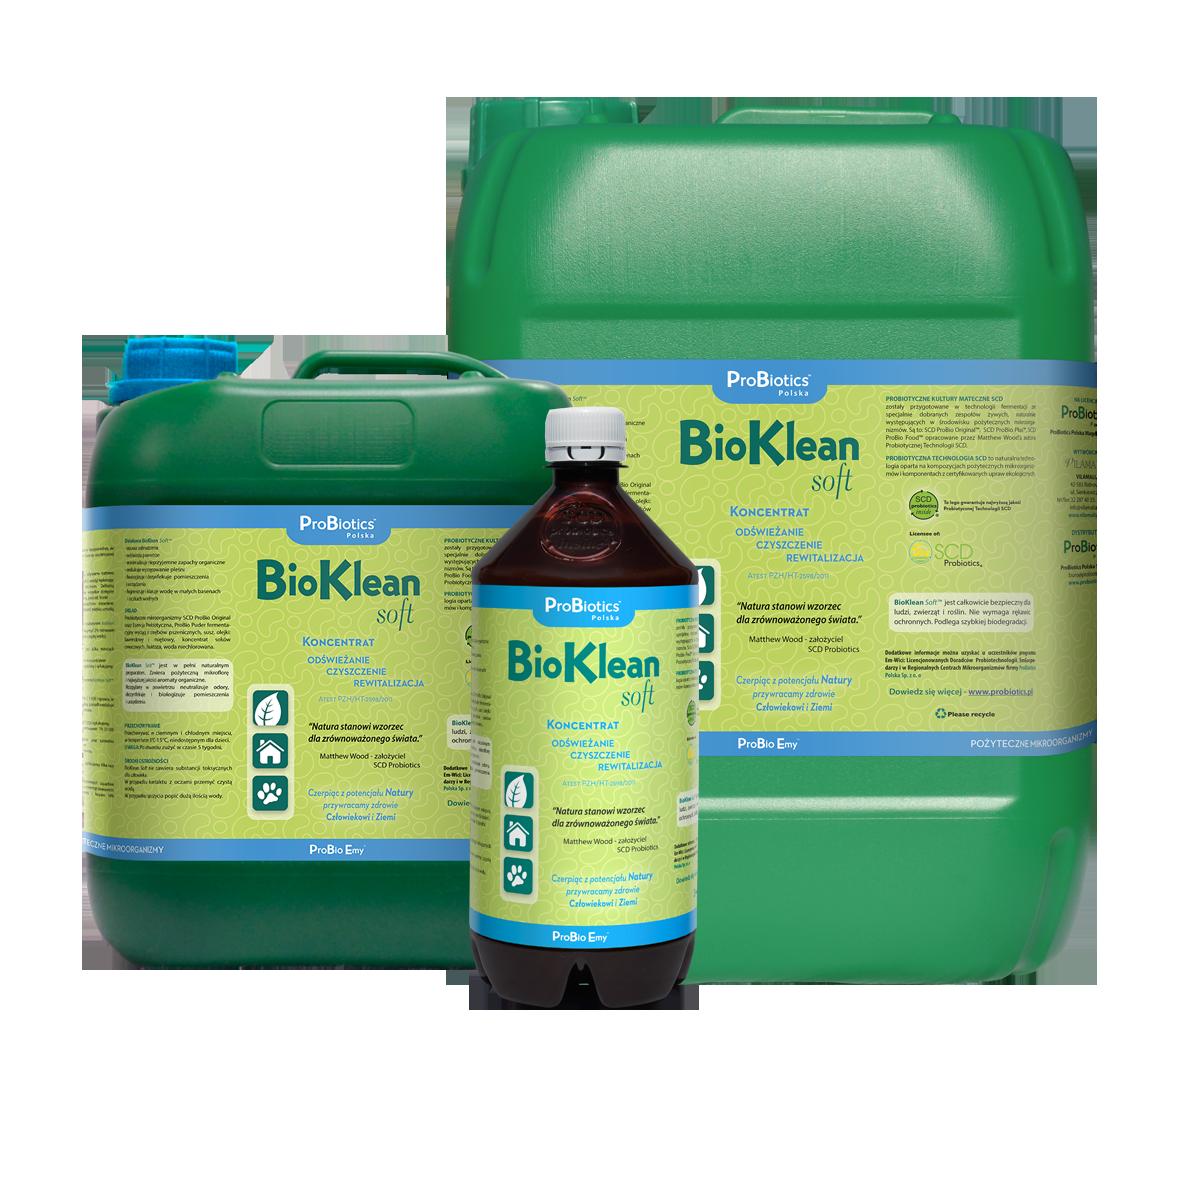 BioKlean soft®